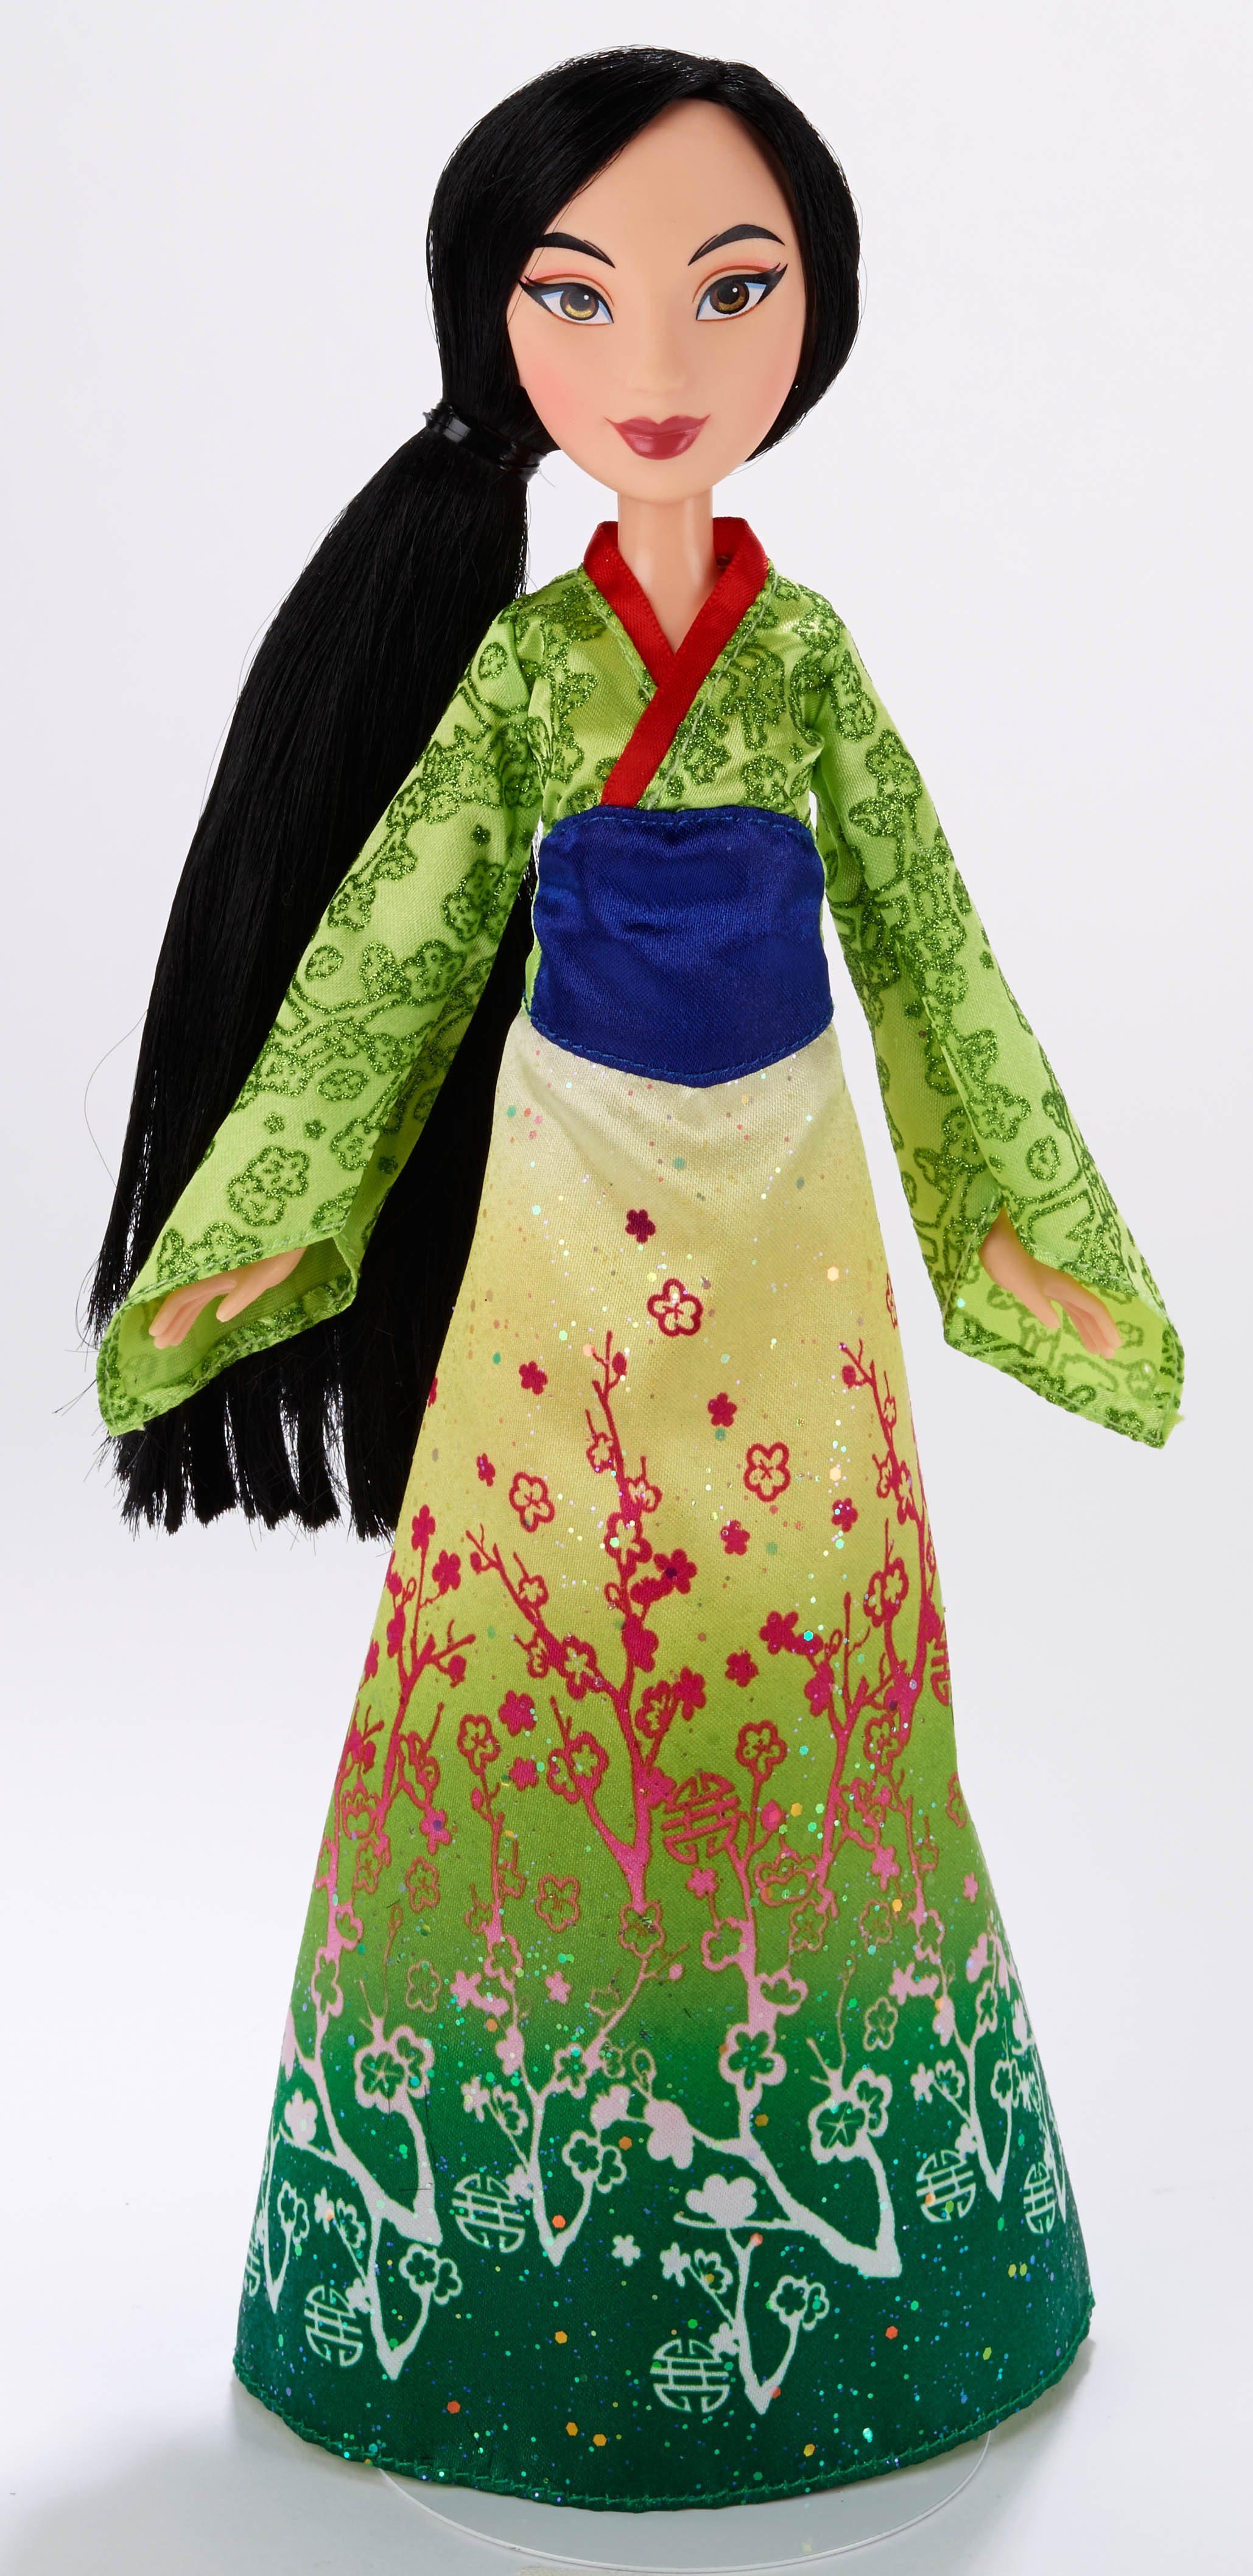 Hasbro Puppe 27 cm, »Disney Princess - Schimmerglanz Mulan«